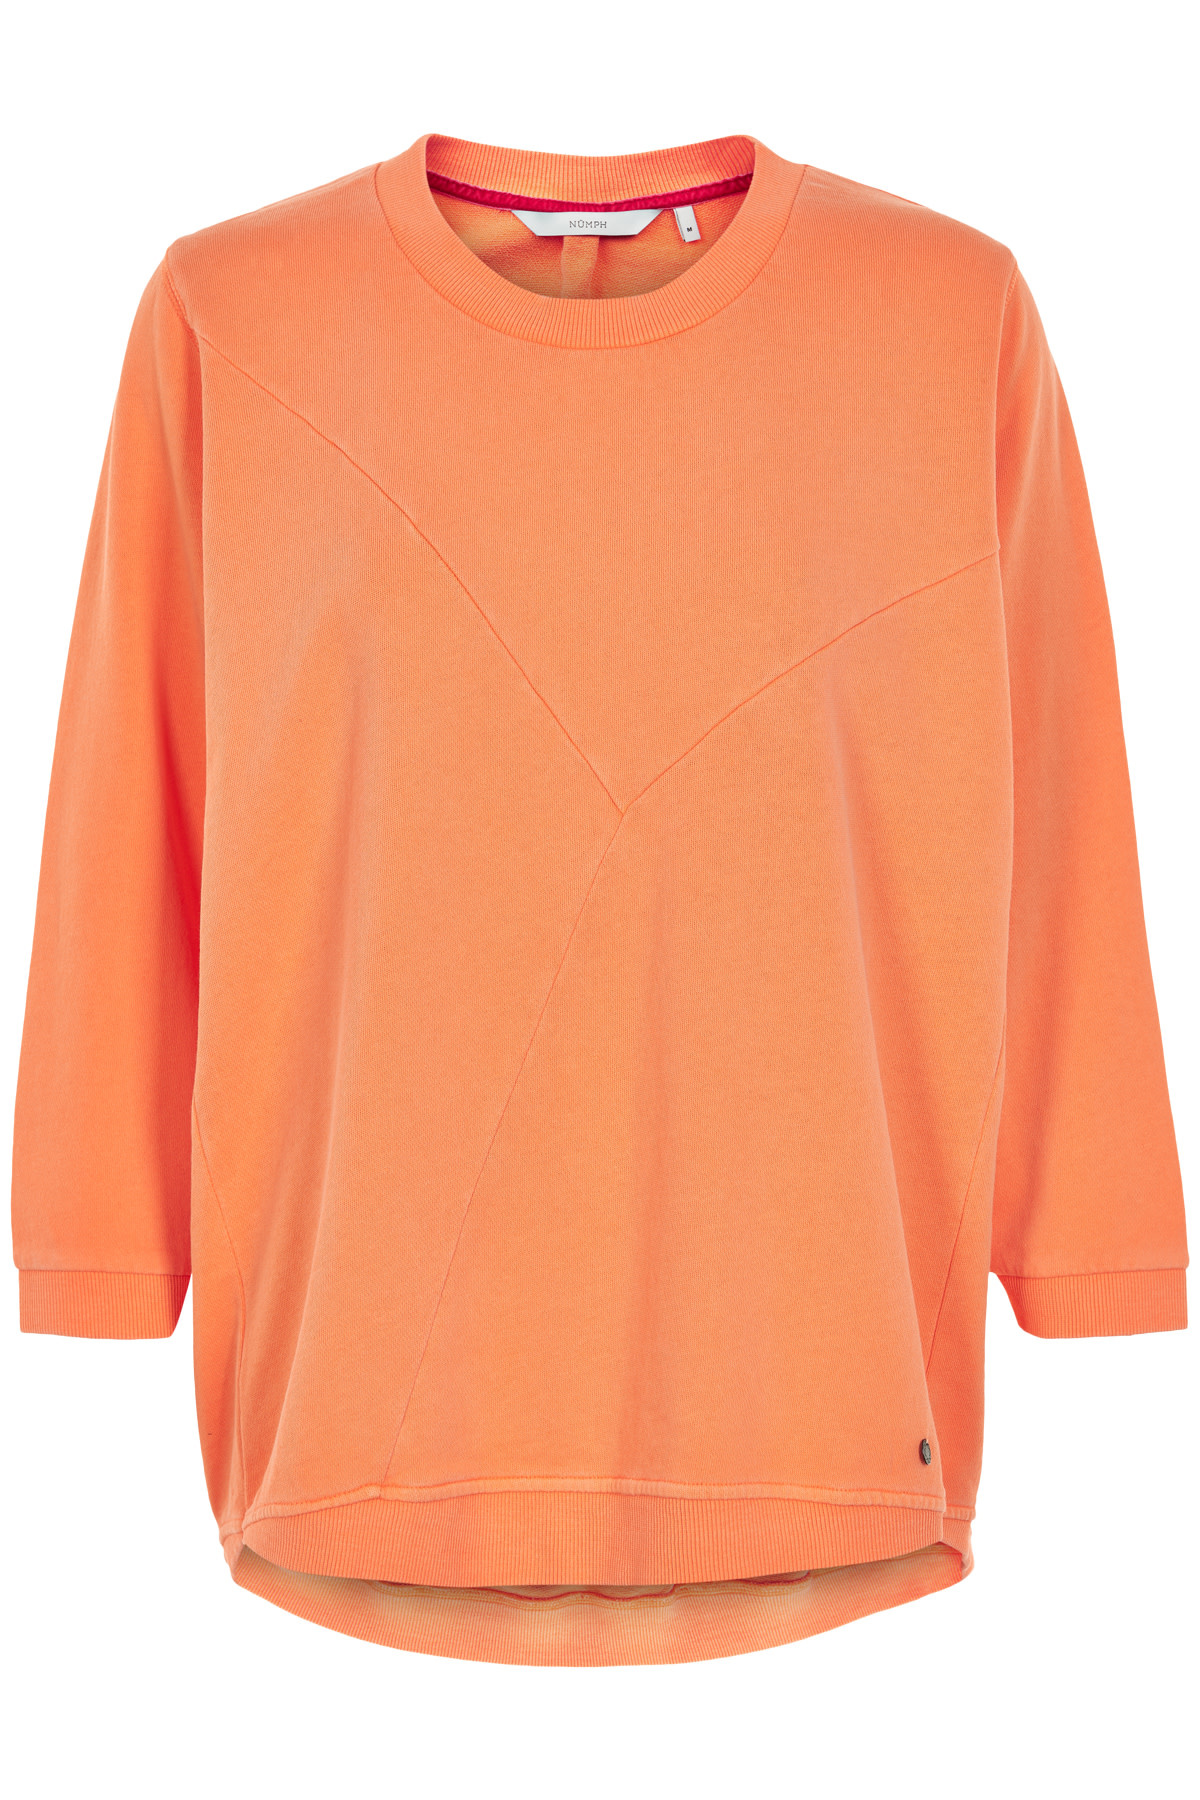 Nümph Nicola SS Sweat - Oranje